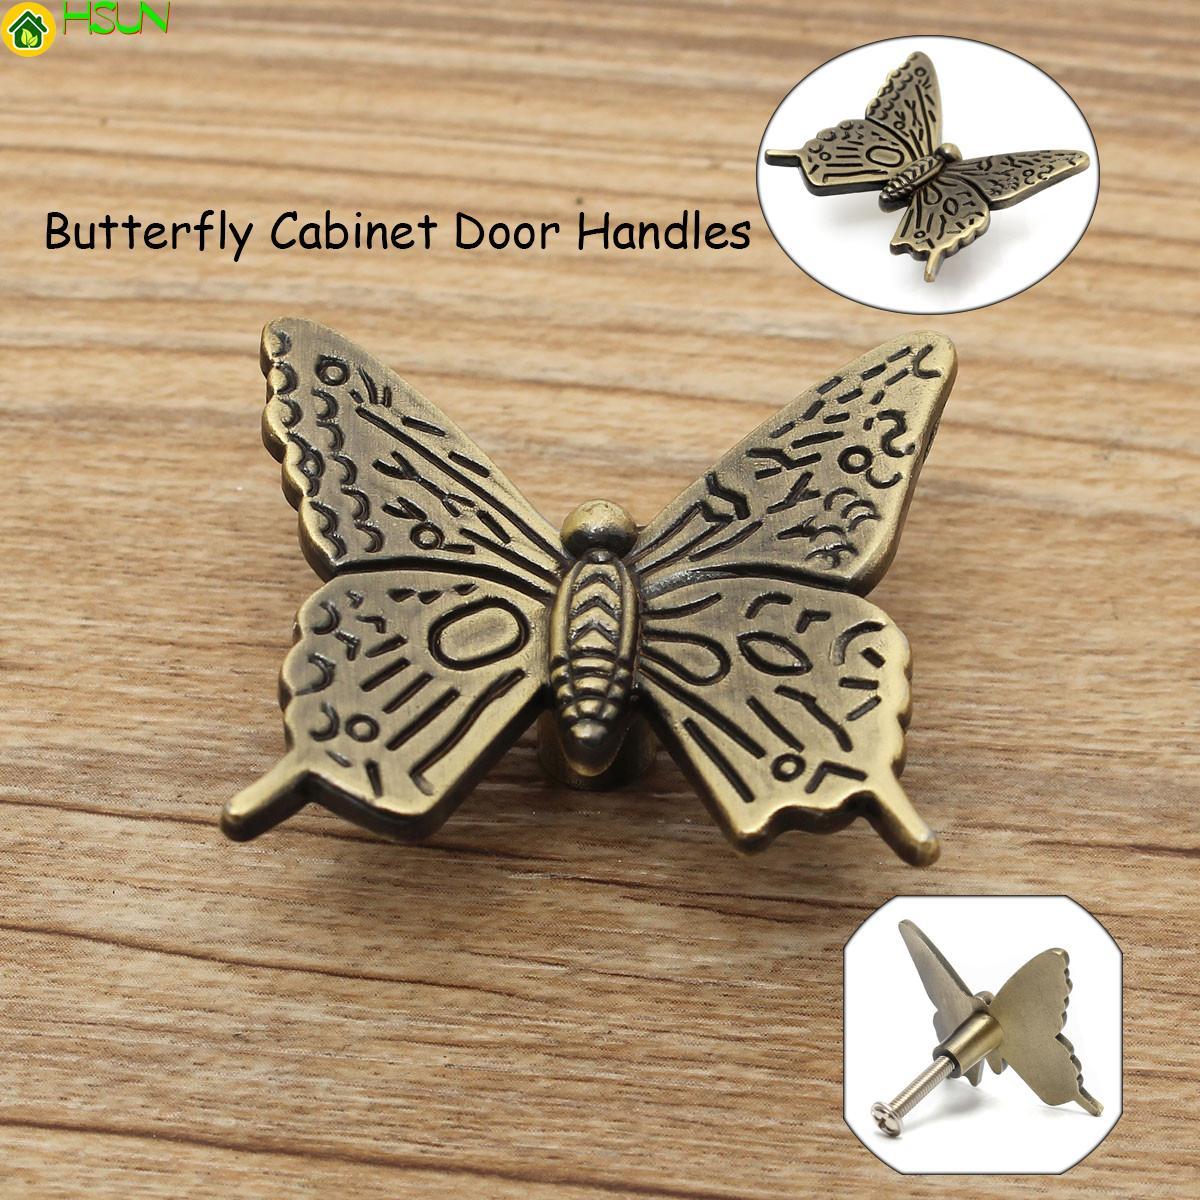 2019 Antique Butterfly Cupboard Door Handle Kitchen Cabinet Pull